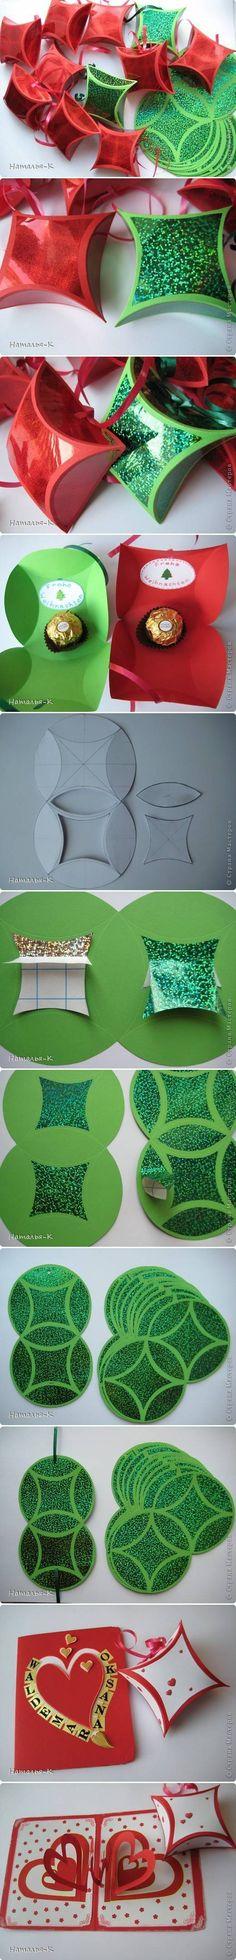 DIY Candy Gift Box DIY Projects | UsefulDIY.com Follow Us on Facebook ==> http://www.facebook.com/UsefulDiy